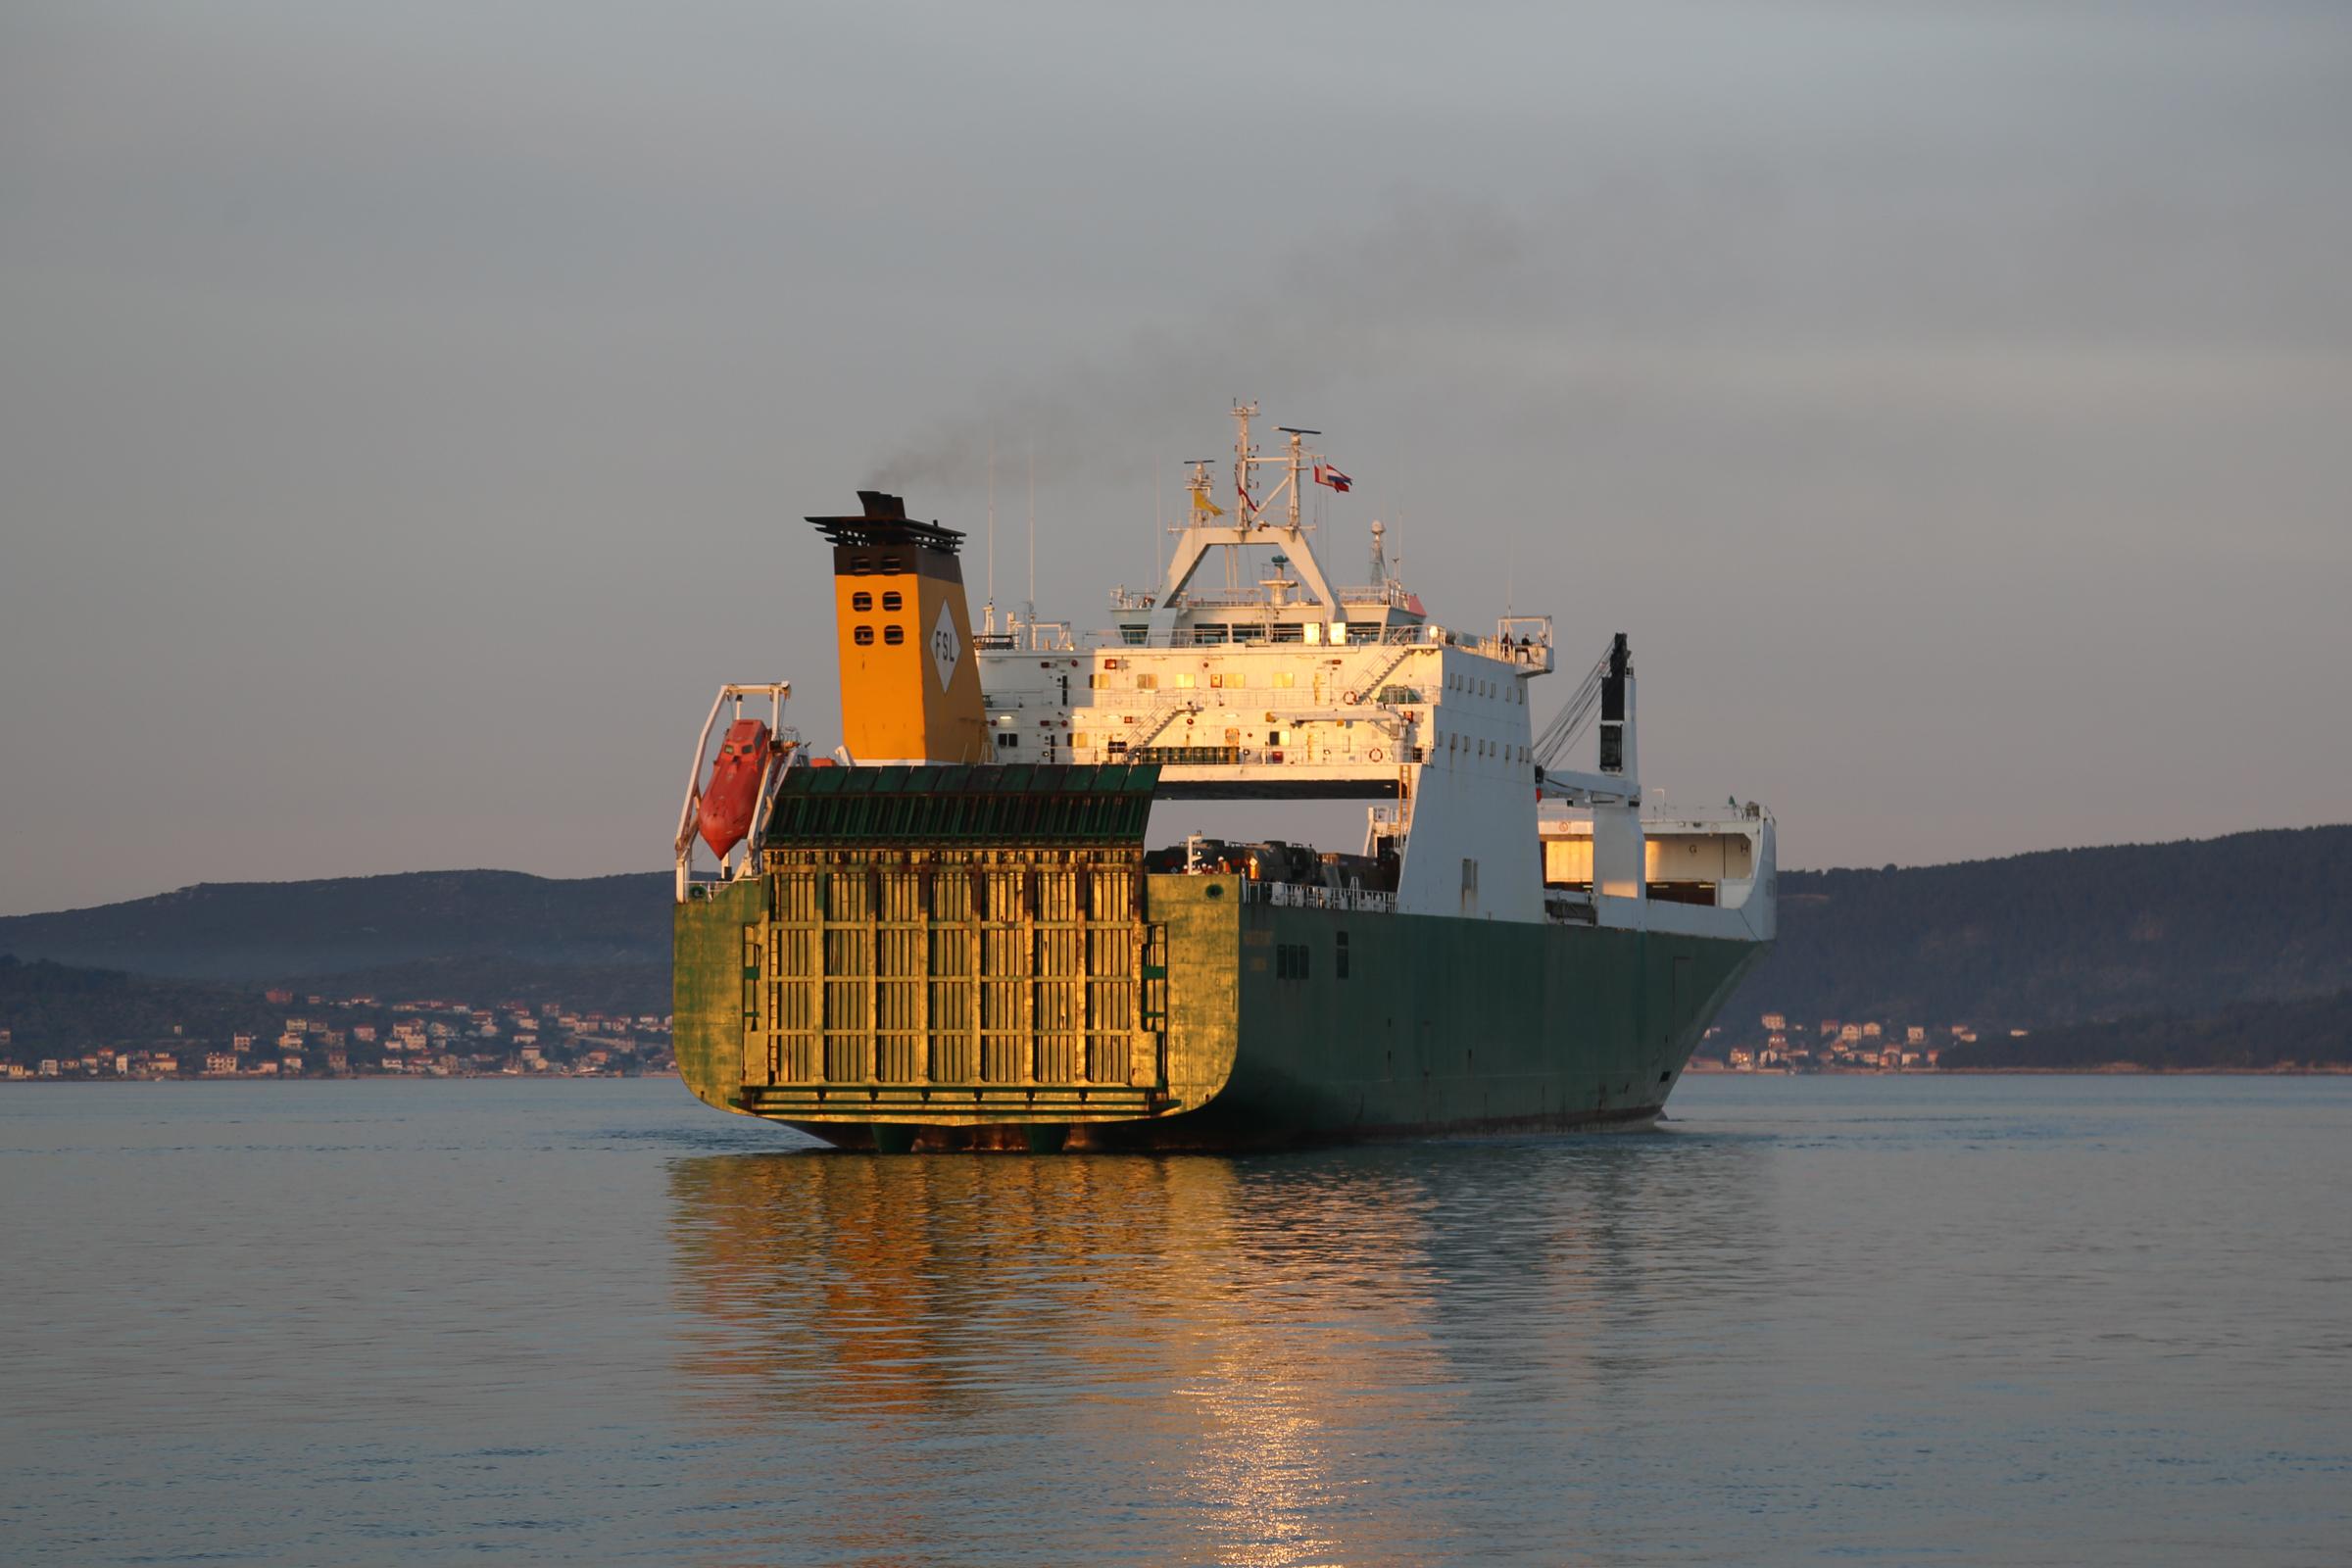 Britanskim brodom dopremljena oprema za potporu vježbe Immediate Response 21